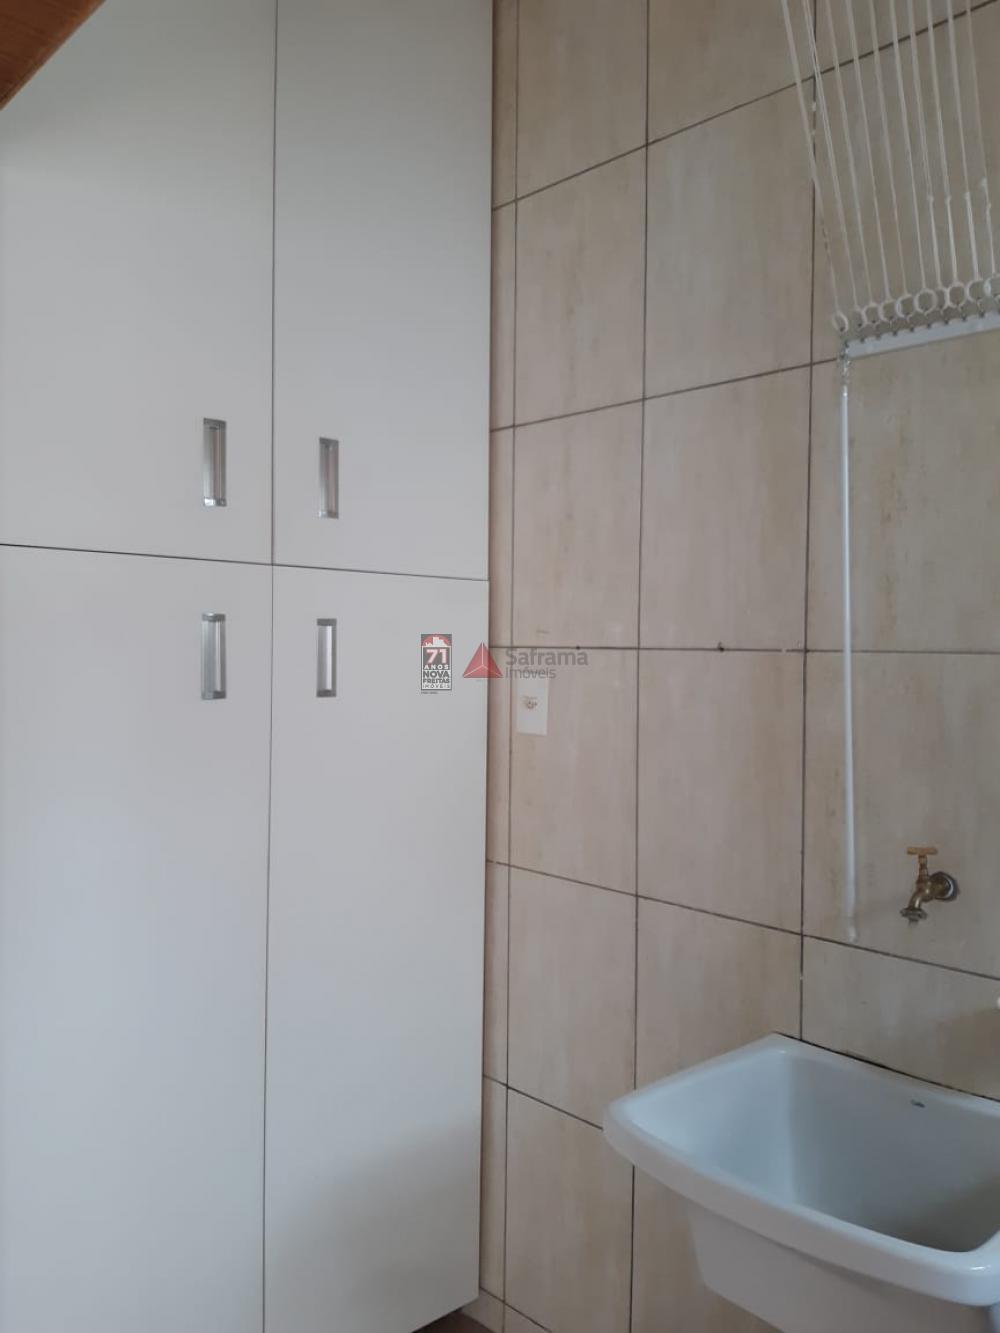 Comprar Casa / Padrão em Pindamonhangaba R$ 350.000,00 - Foto 19